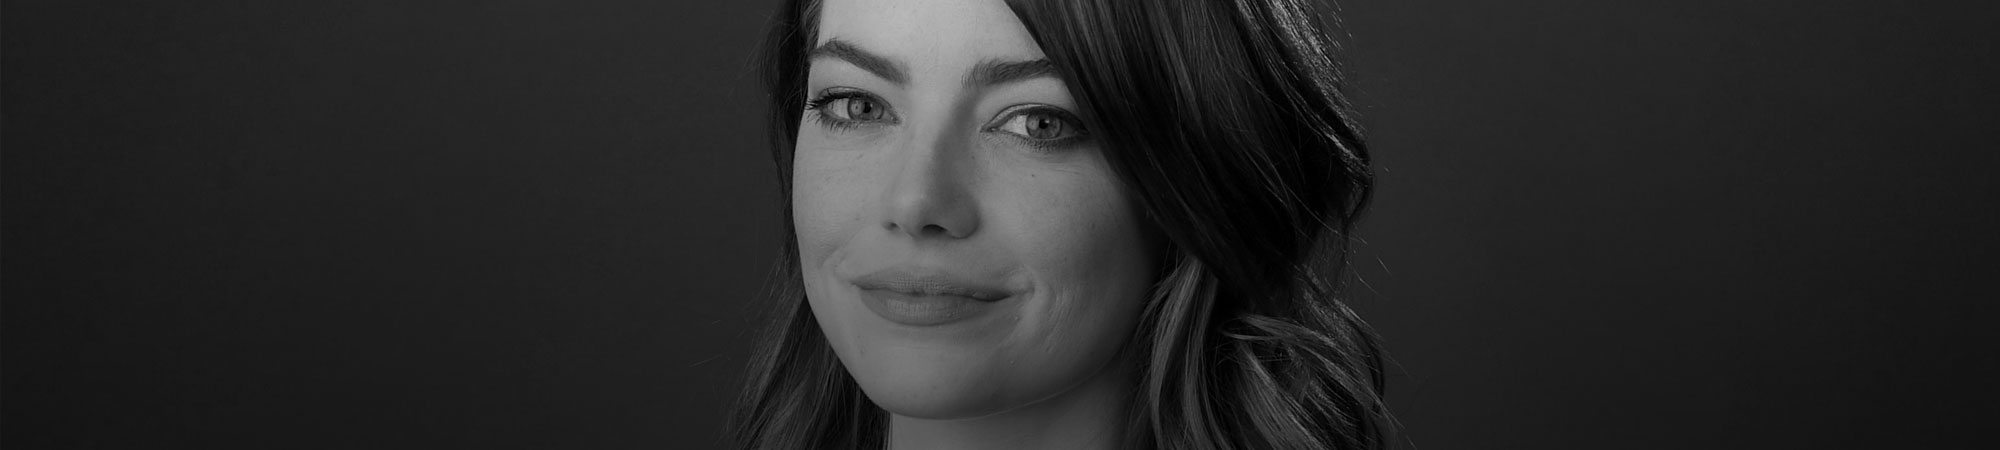 Celebrity Interview: Emma Stone